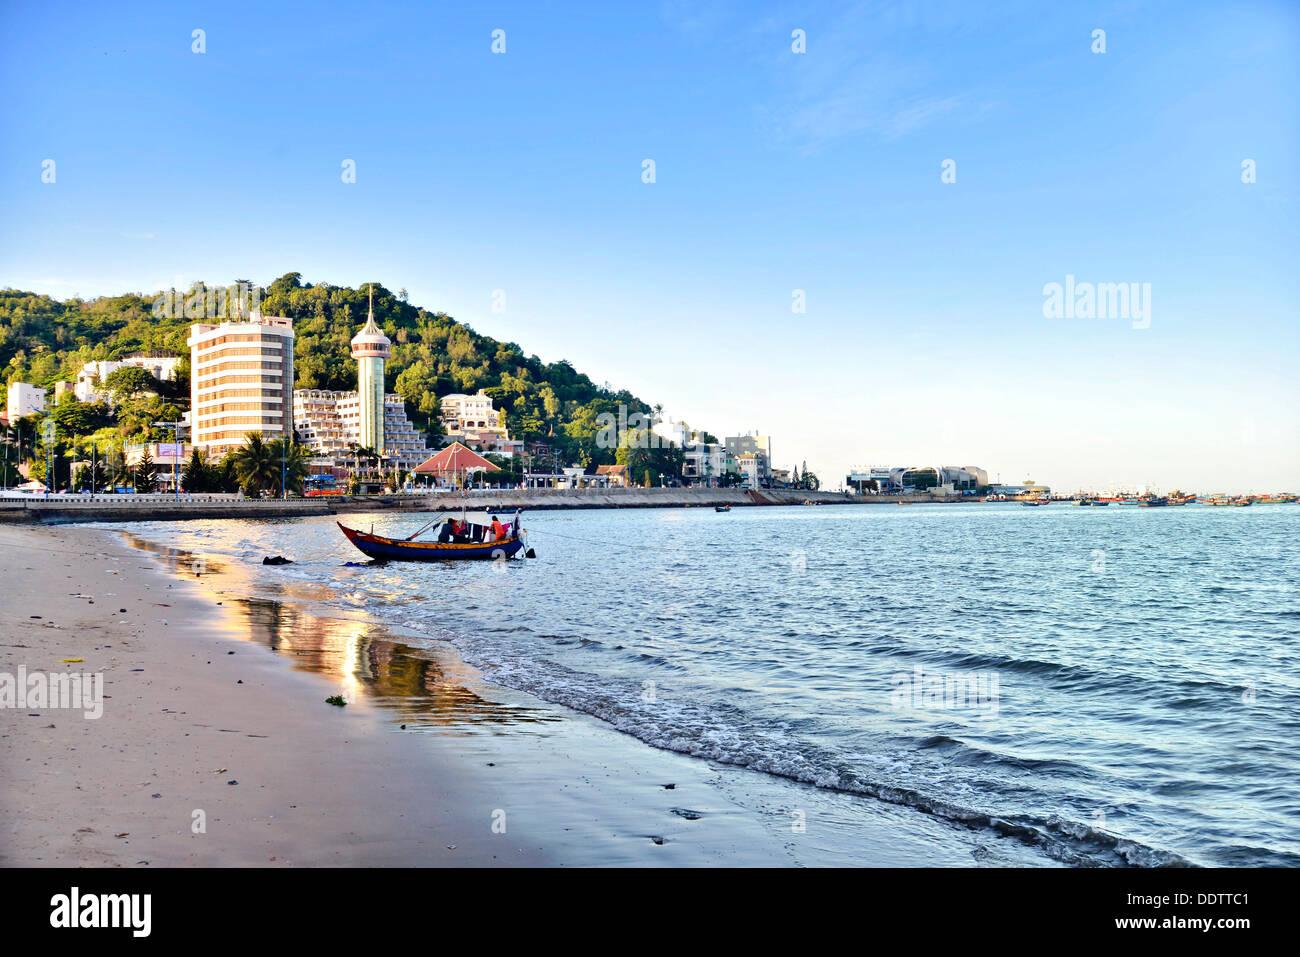 Vung Tau, Bai Truoc, frente a la playa, Vietnam Foto de stock